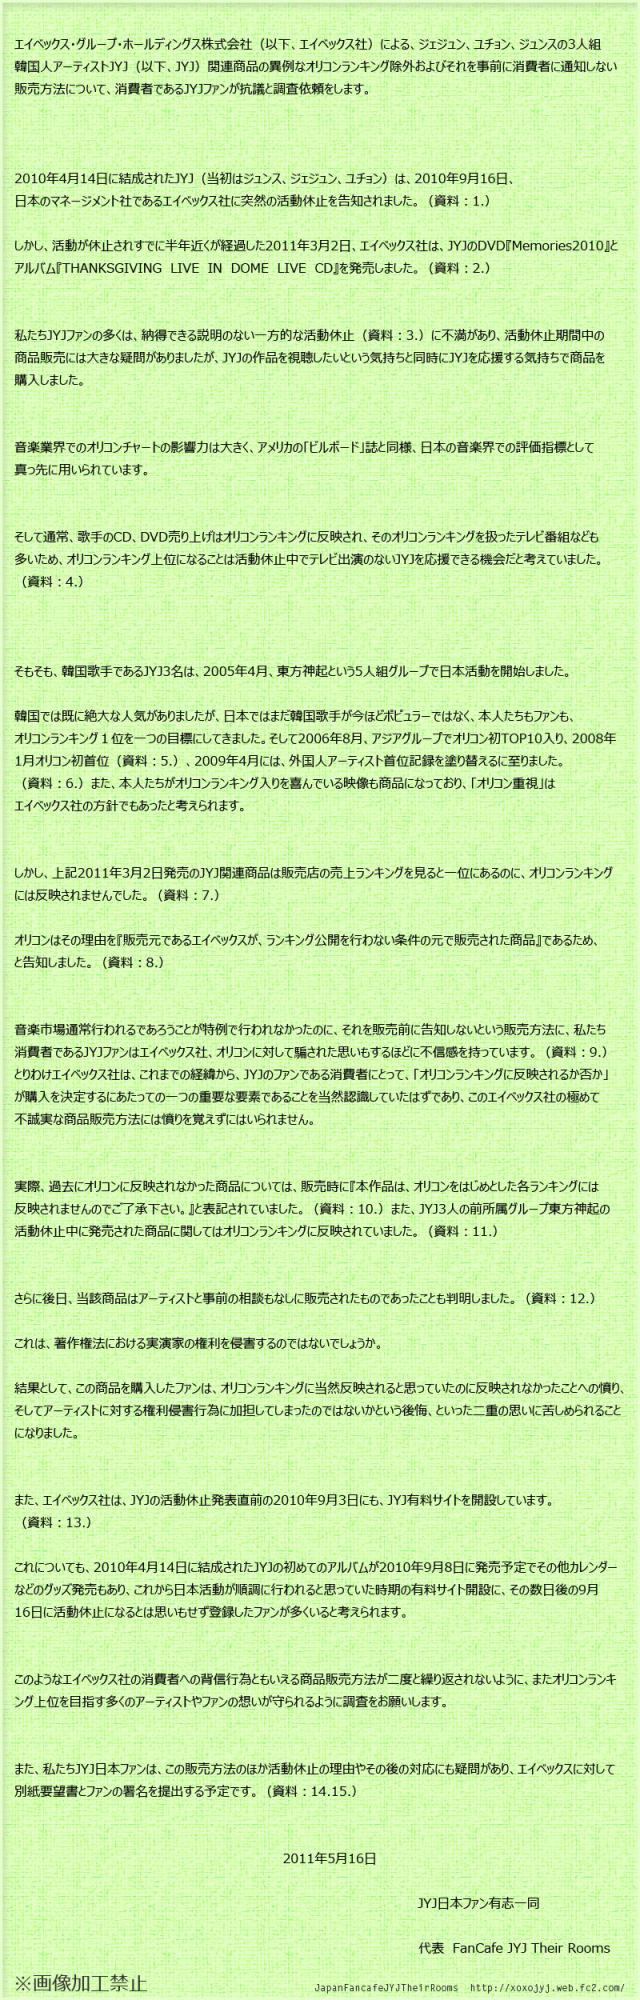 syouhisyatyou1_convert_20110524235956.jpg